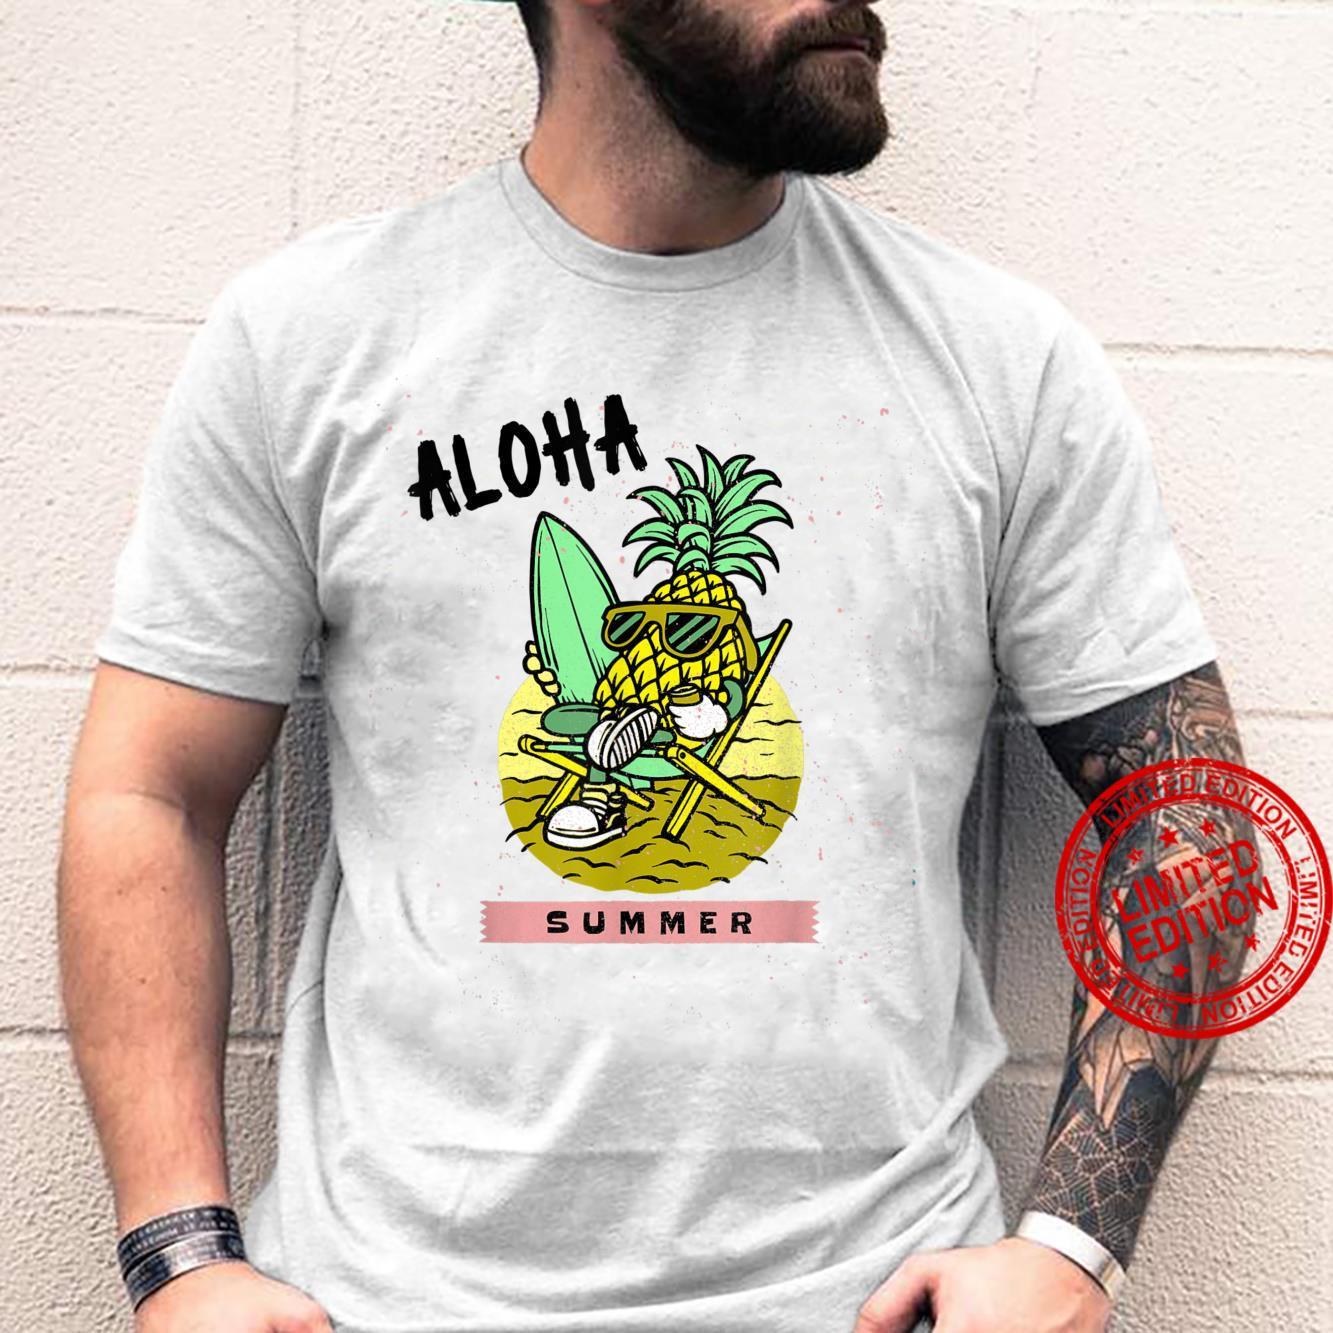 Aloha Summer Pineapple Surfer Shirt